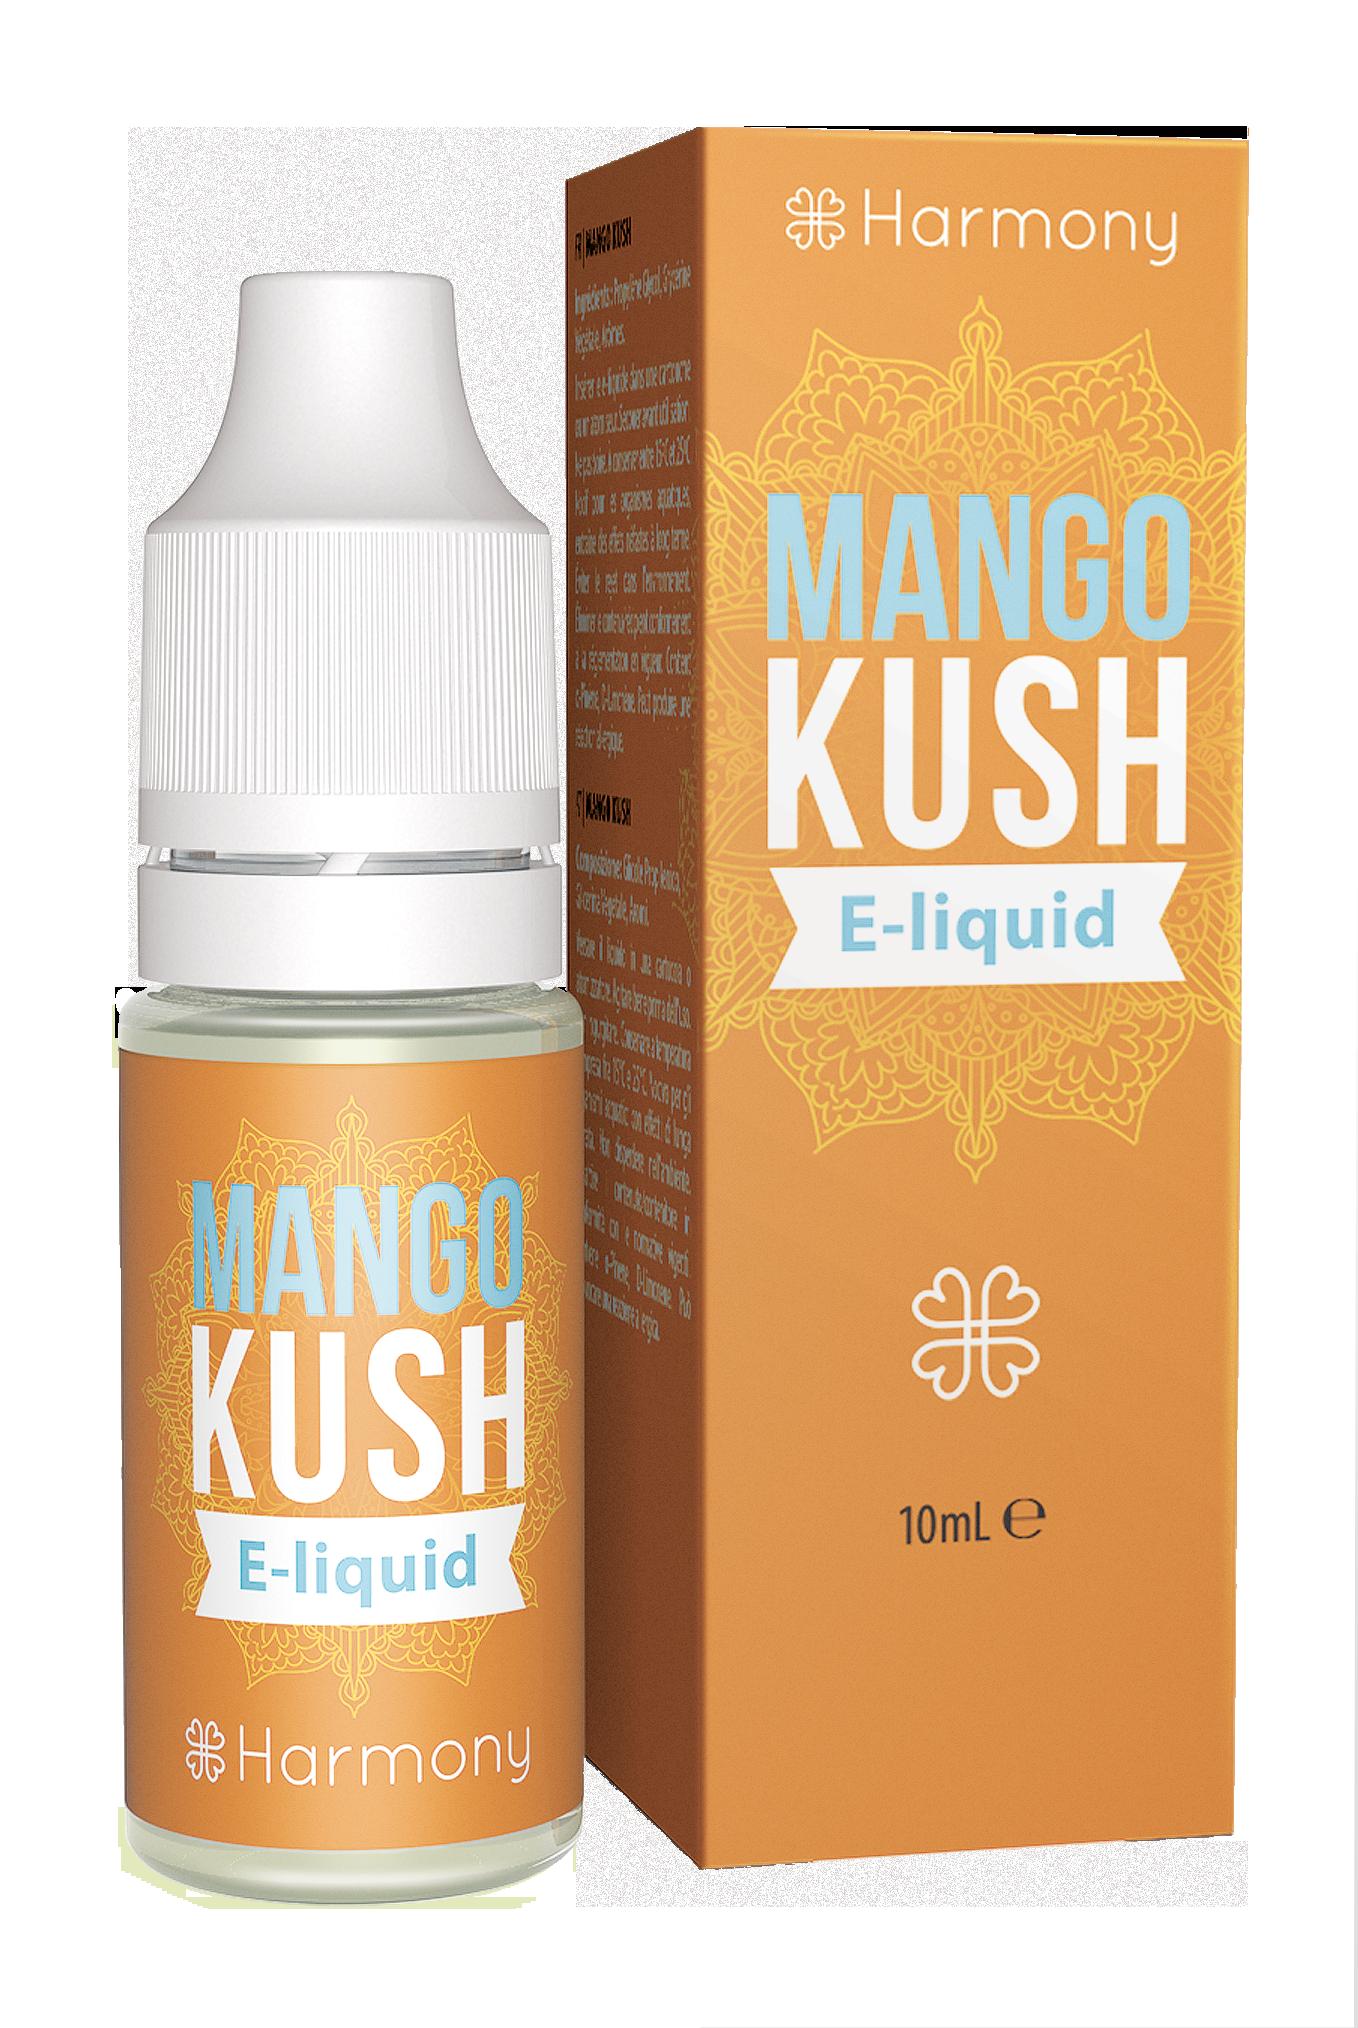 Harmony CBD E-Liquid - 30mg CBD - Geschmackssorte Mango Kush - 10ml